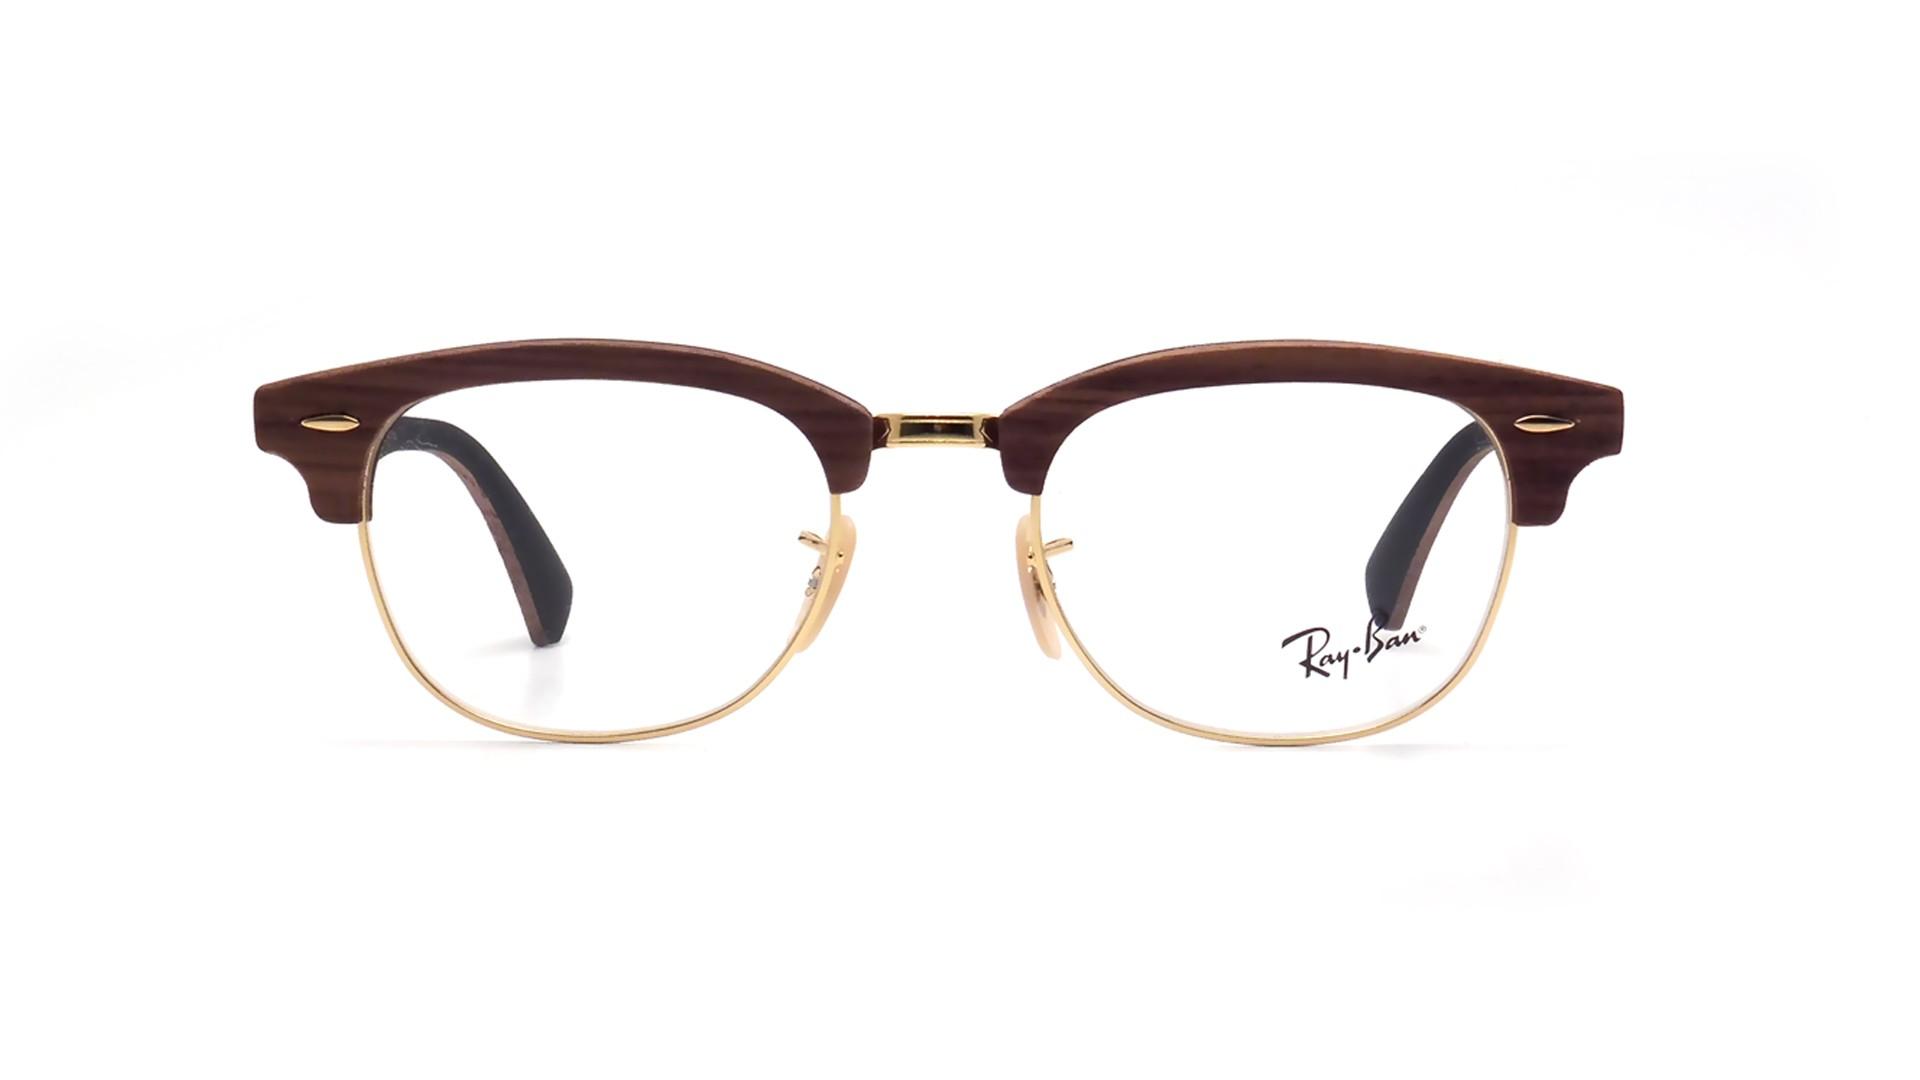 632e7df3919 Ray Ban Deals Malta. Buy Ray-Ban RB8058 Frameless Aviator Sunglasses ...